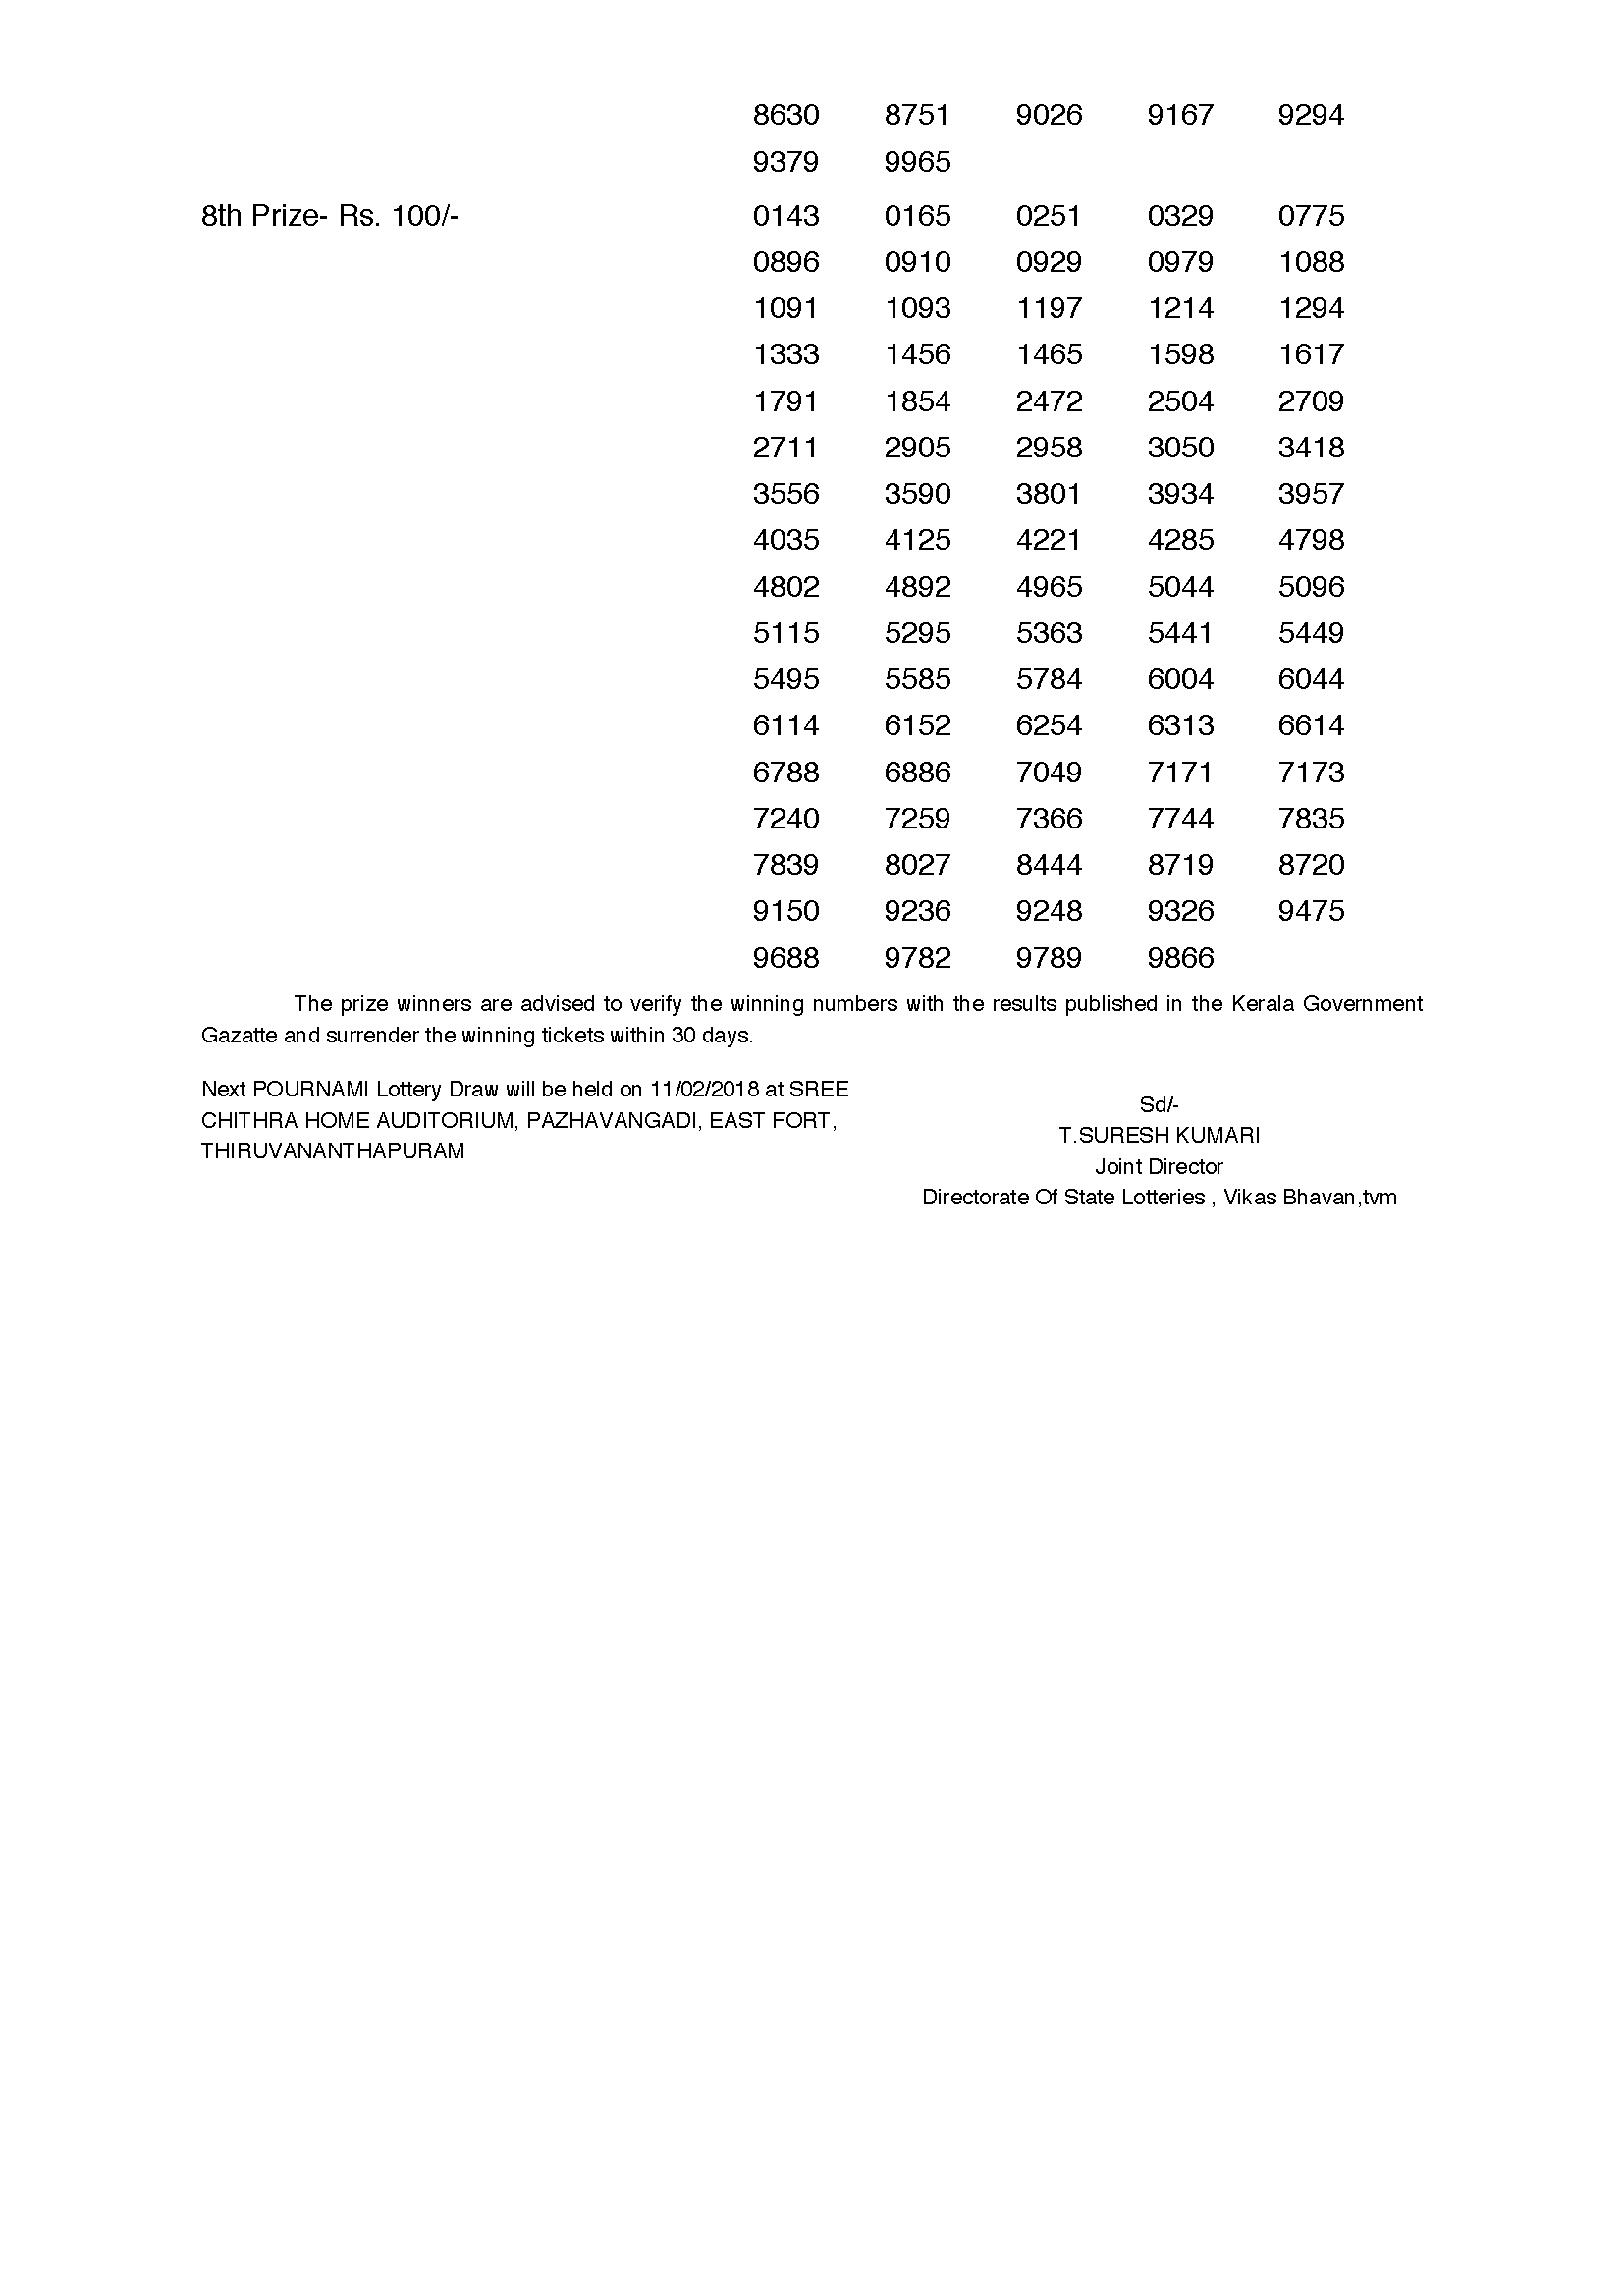 Porunami RN 325 Kerala Lottery Results: Page 2